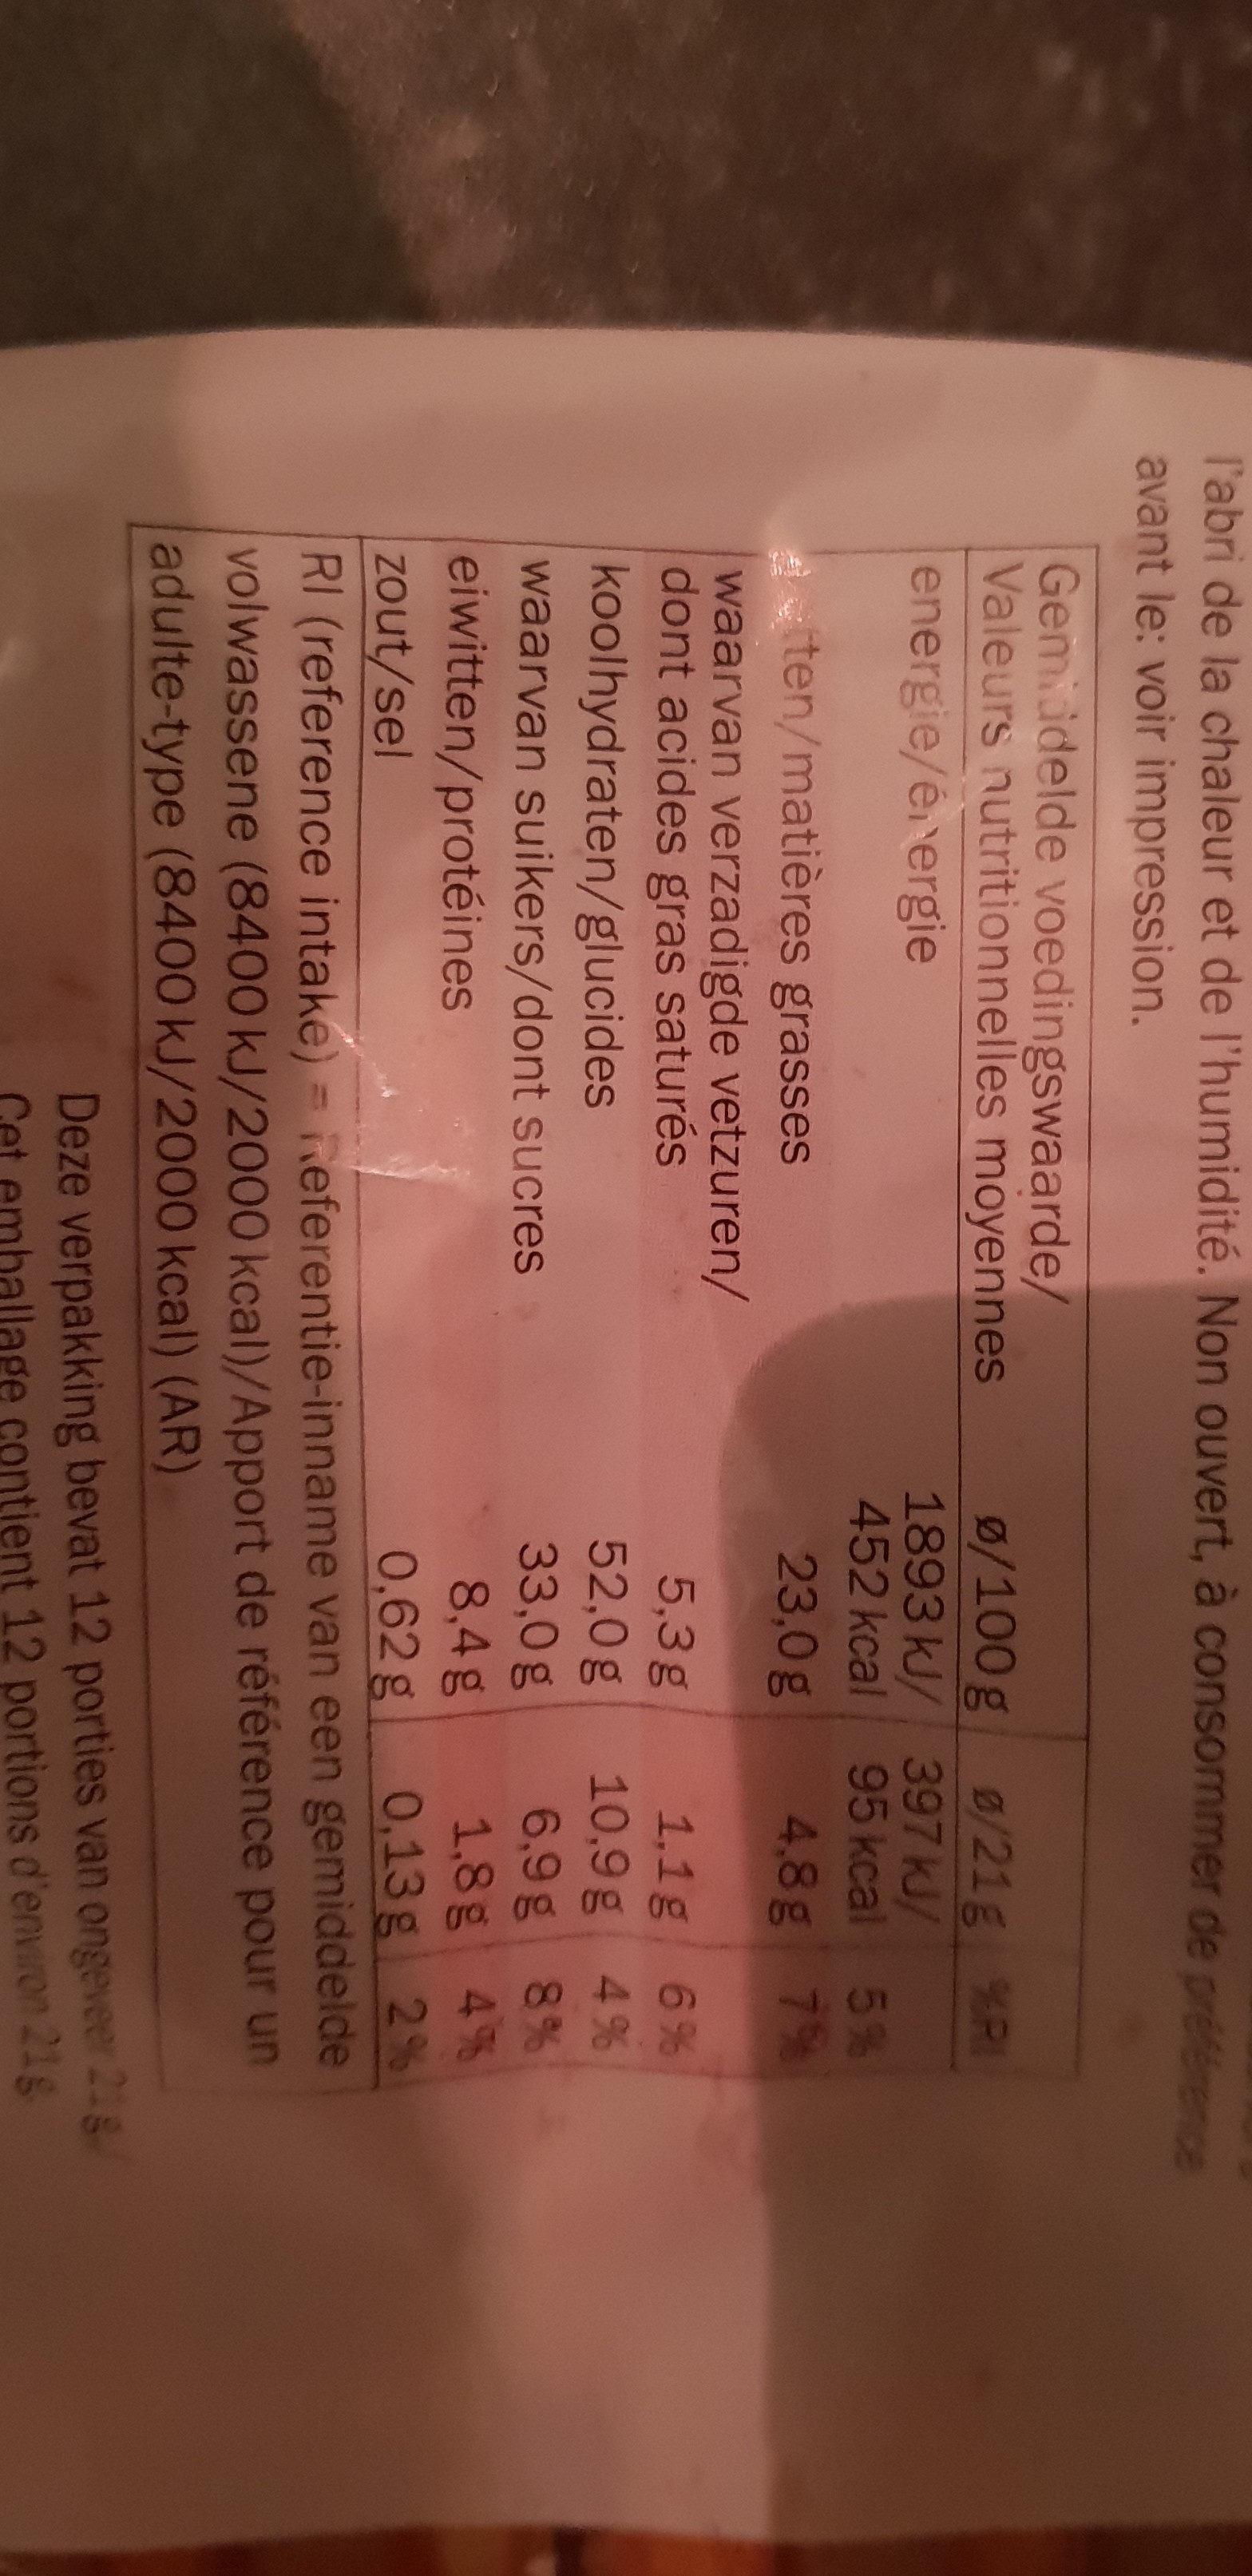 firenze confiserie - Voedingswaarden - fr